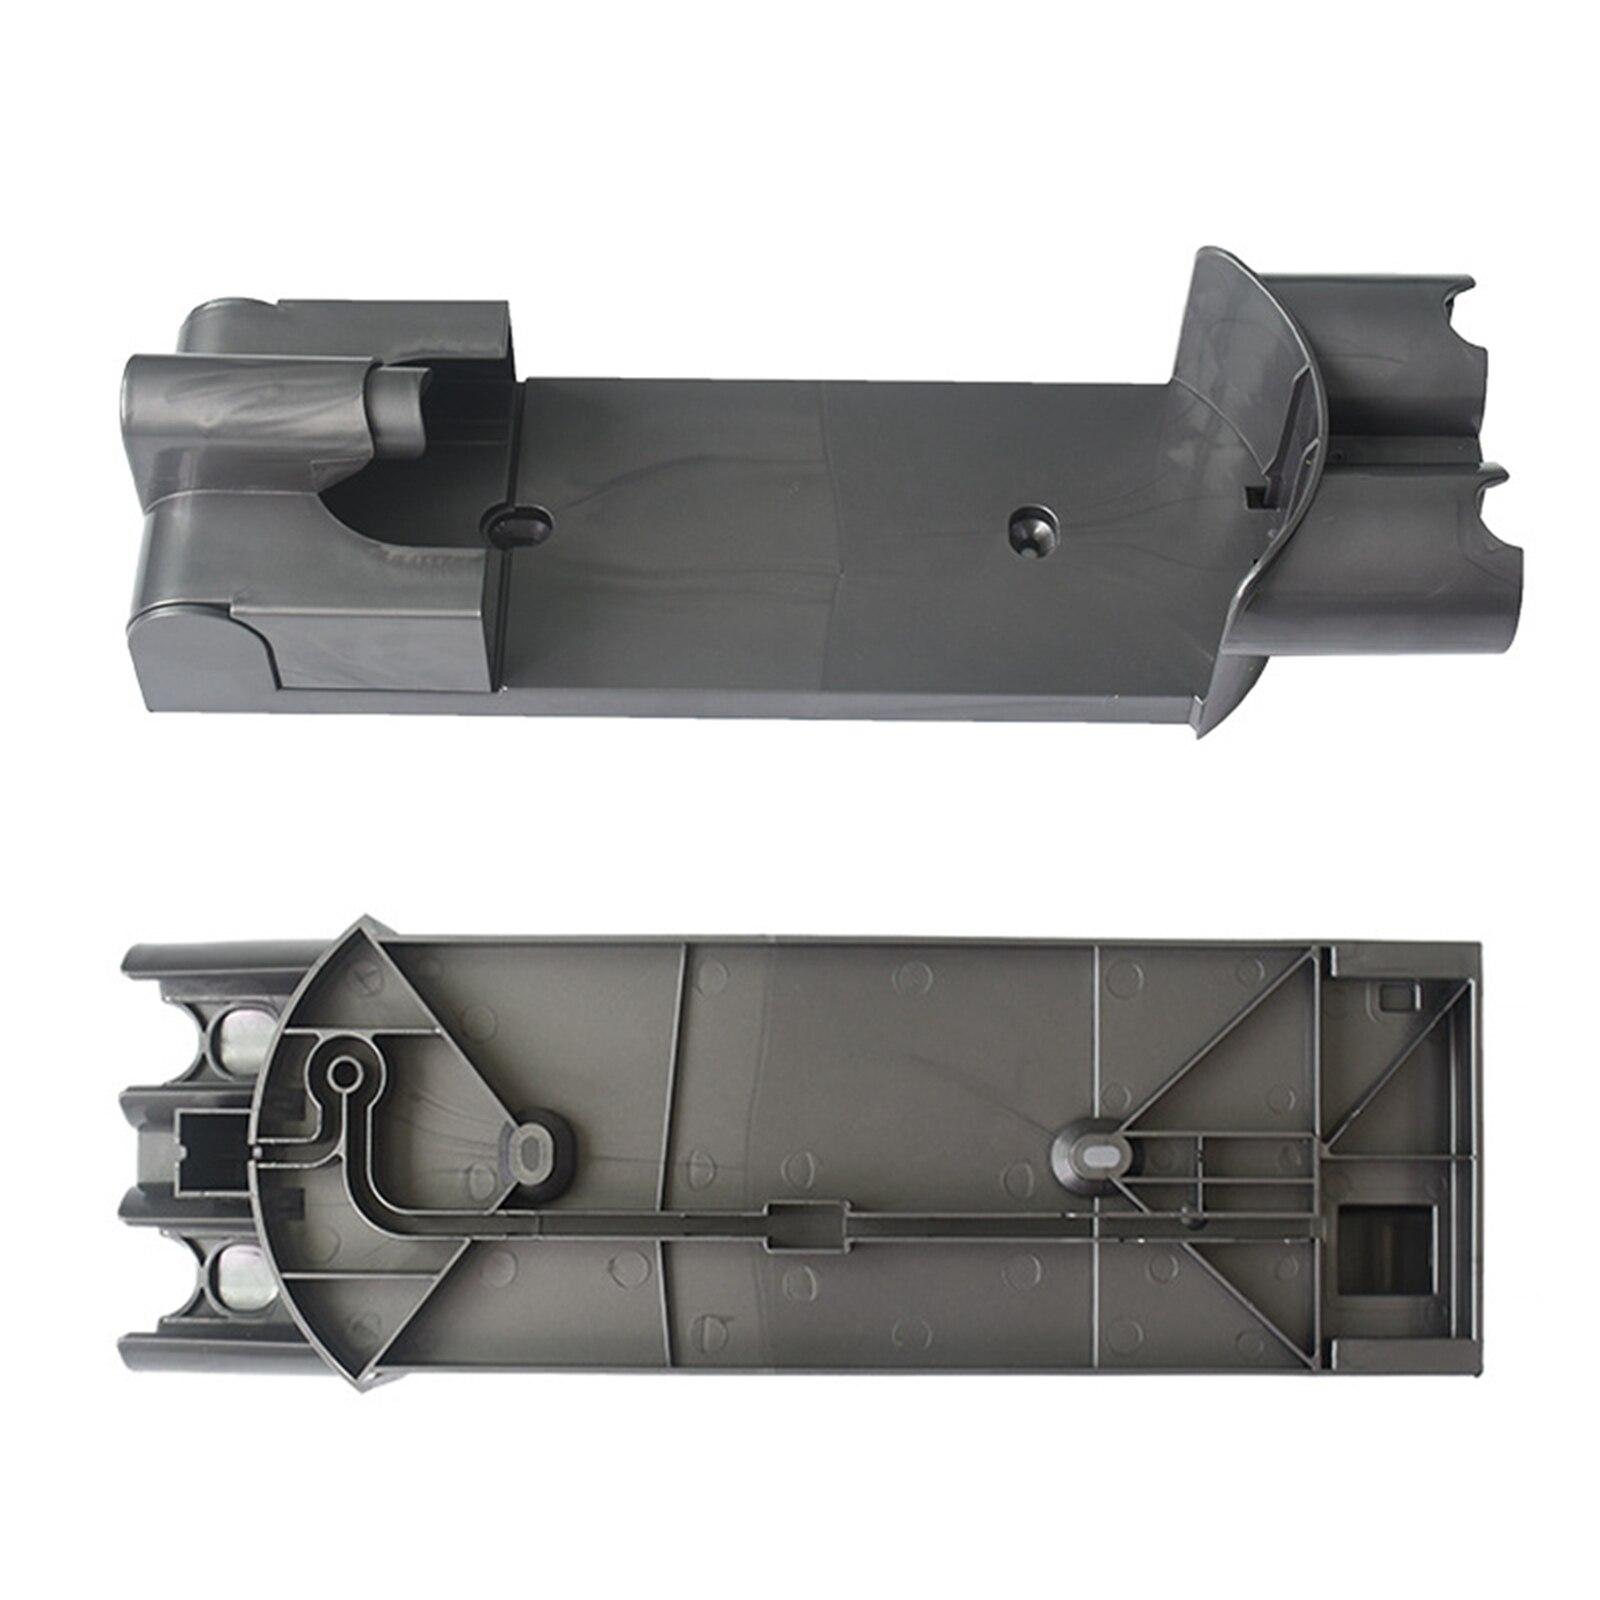 Soporte de pared/estación de acoplamiento para Dyson V7/V8 aspiradora de mano soporte de pared colgador de cargador Base estación de acoplamiento pie